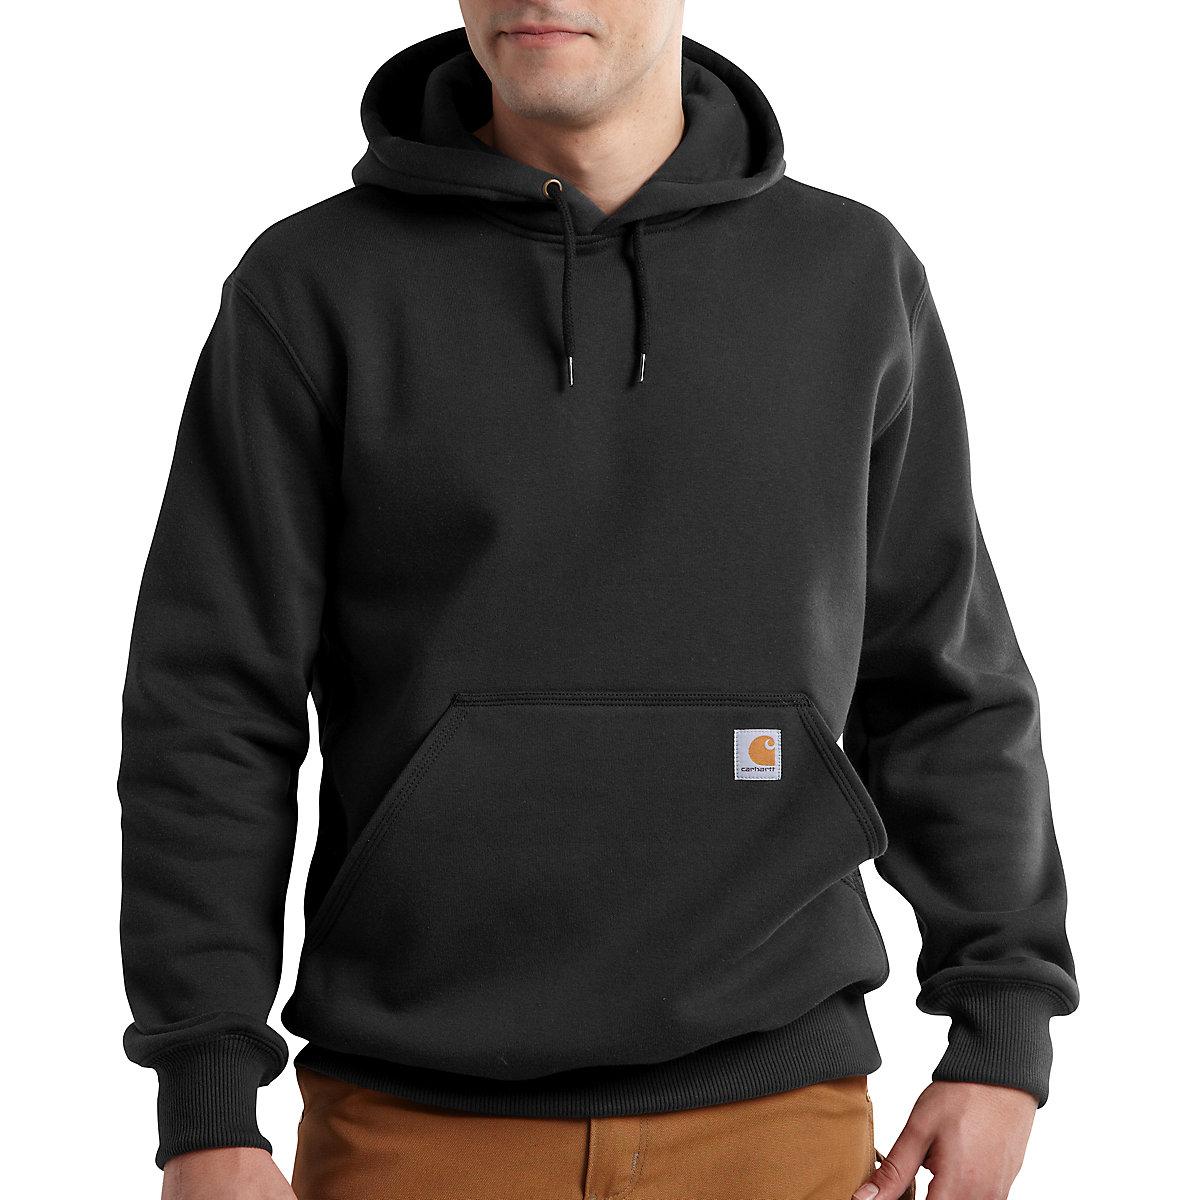 Heavyweight hoodies